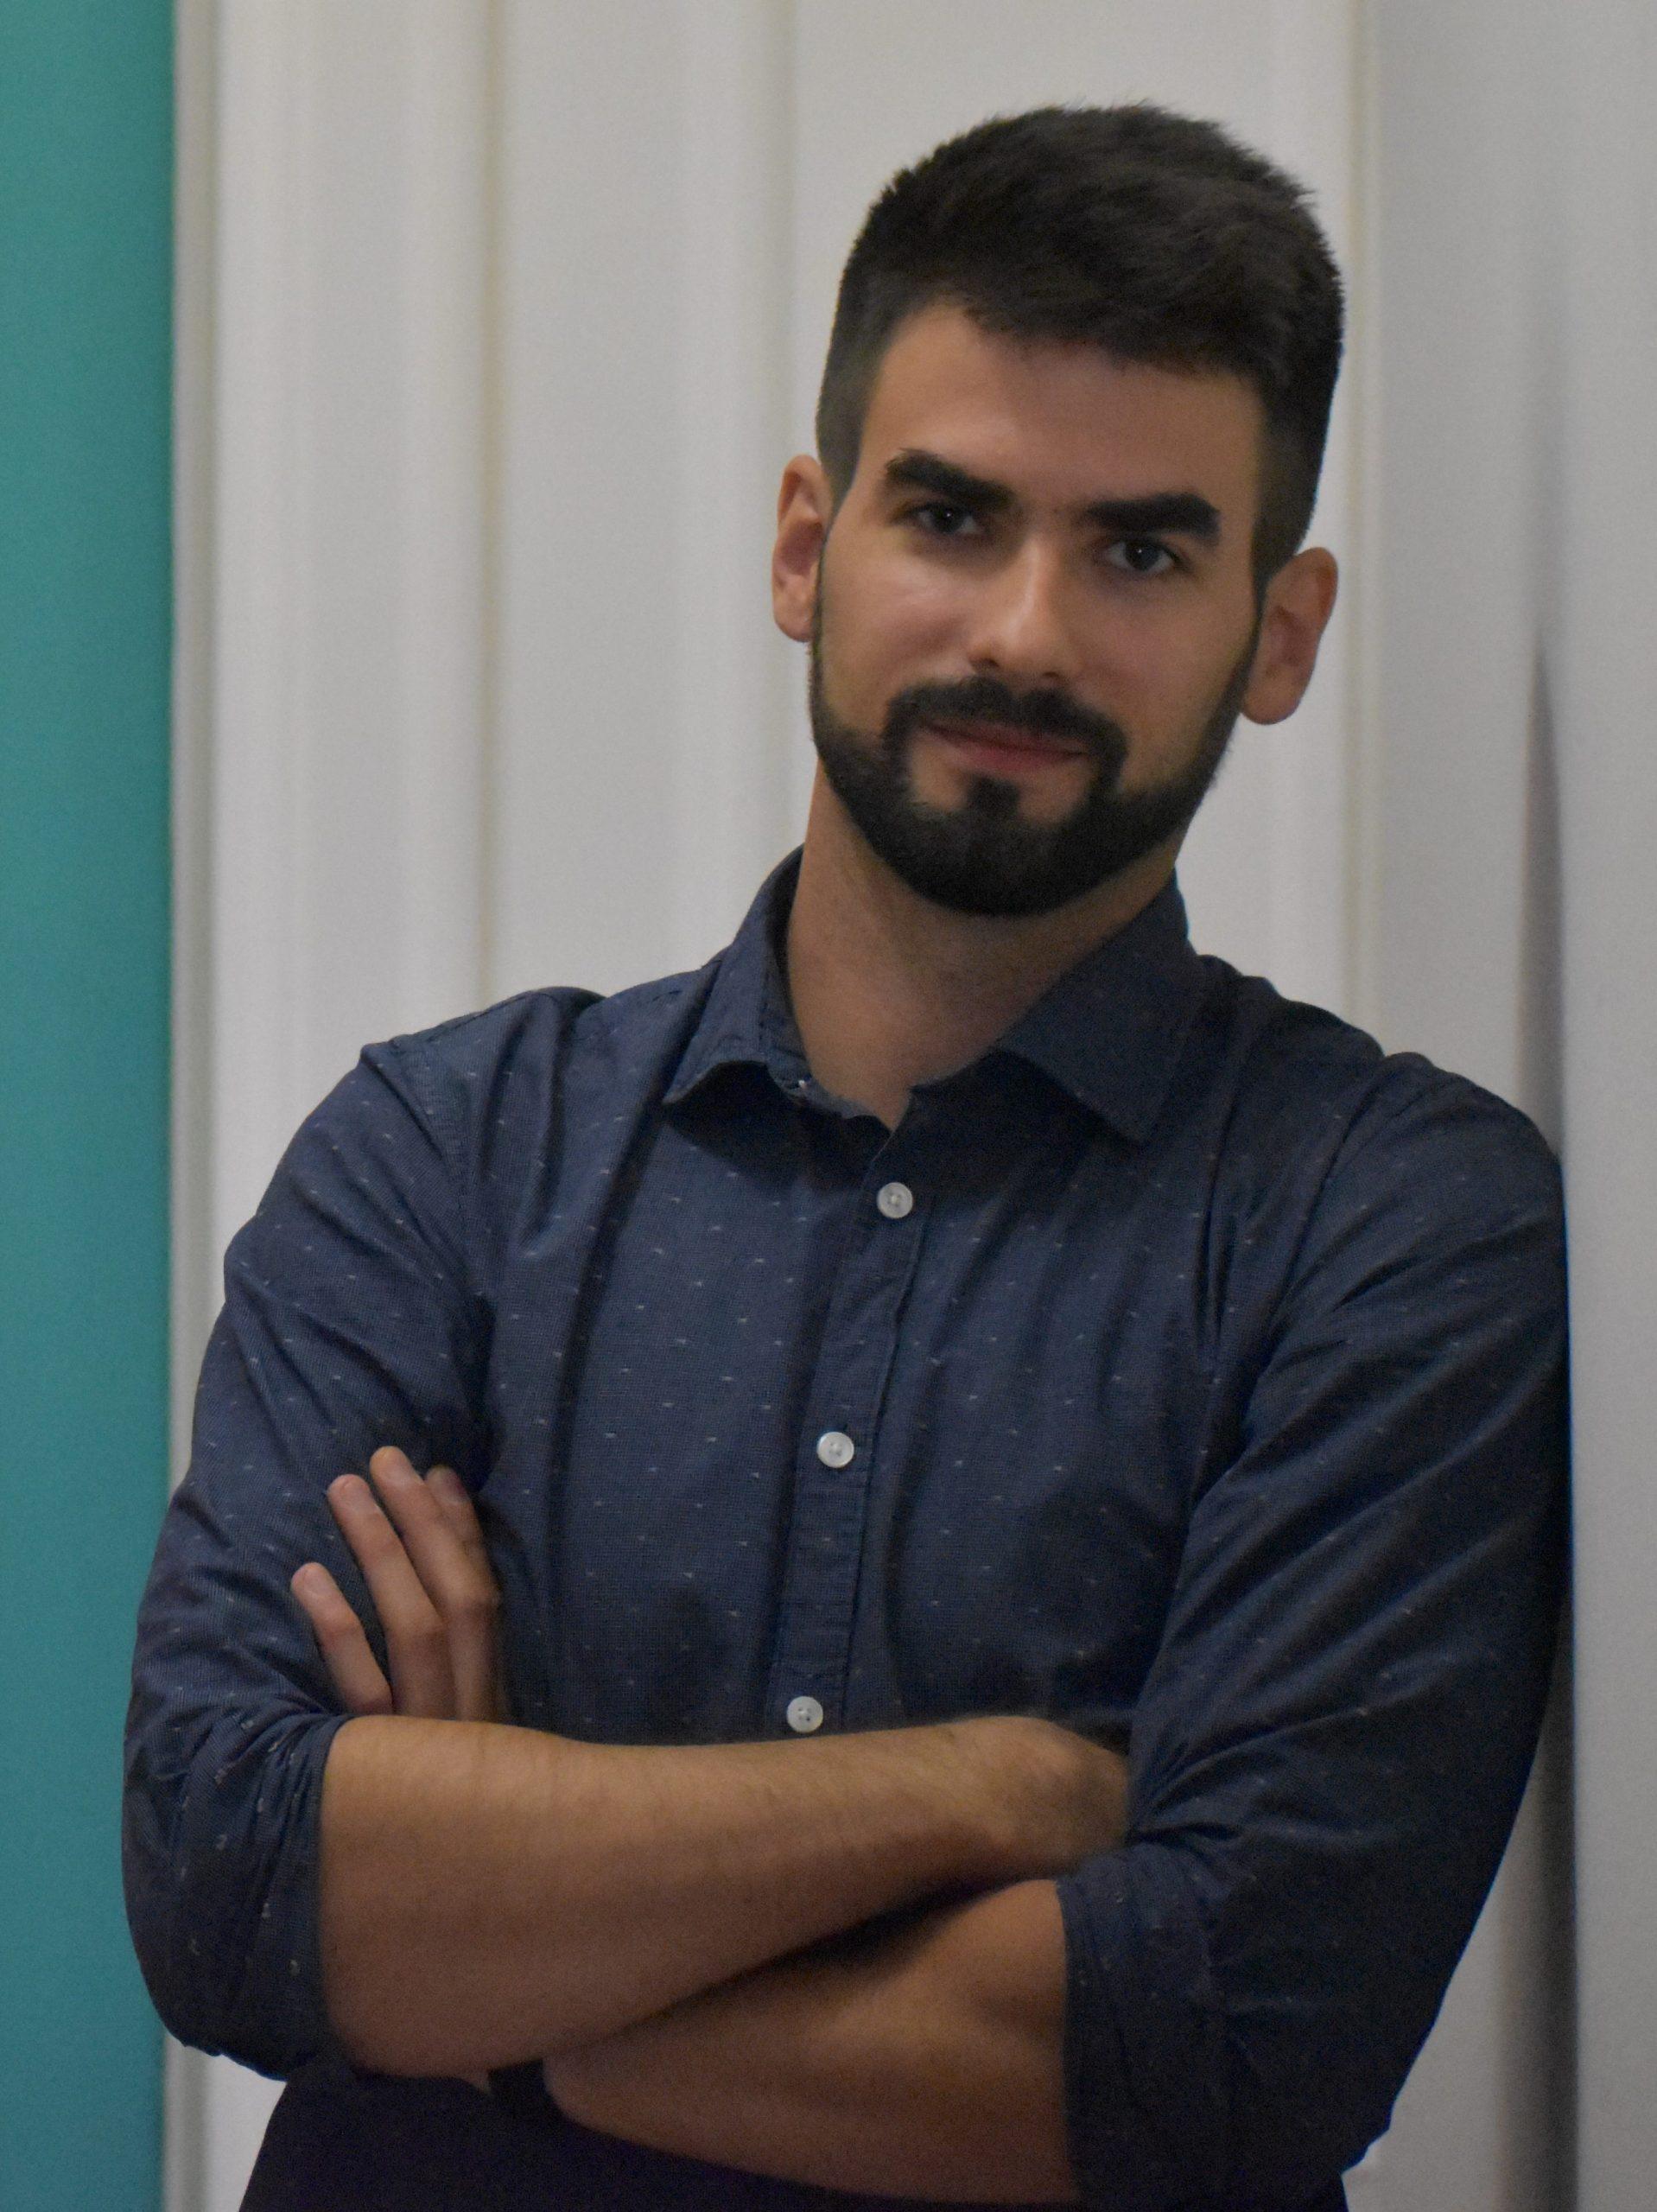 Nikola Glavaš